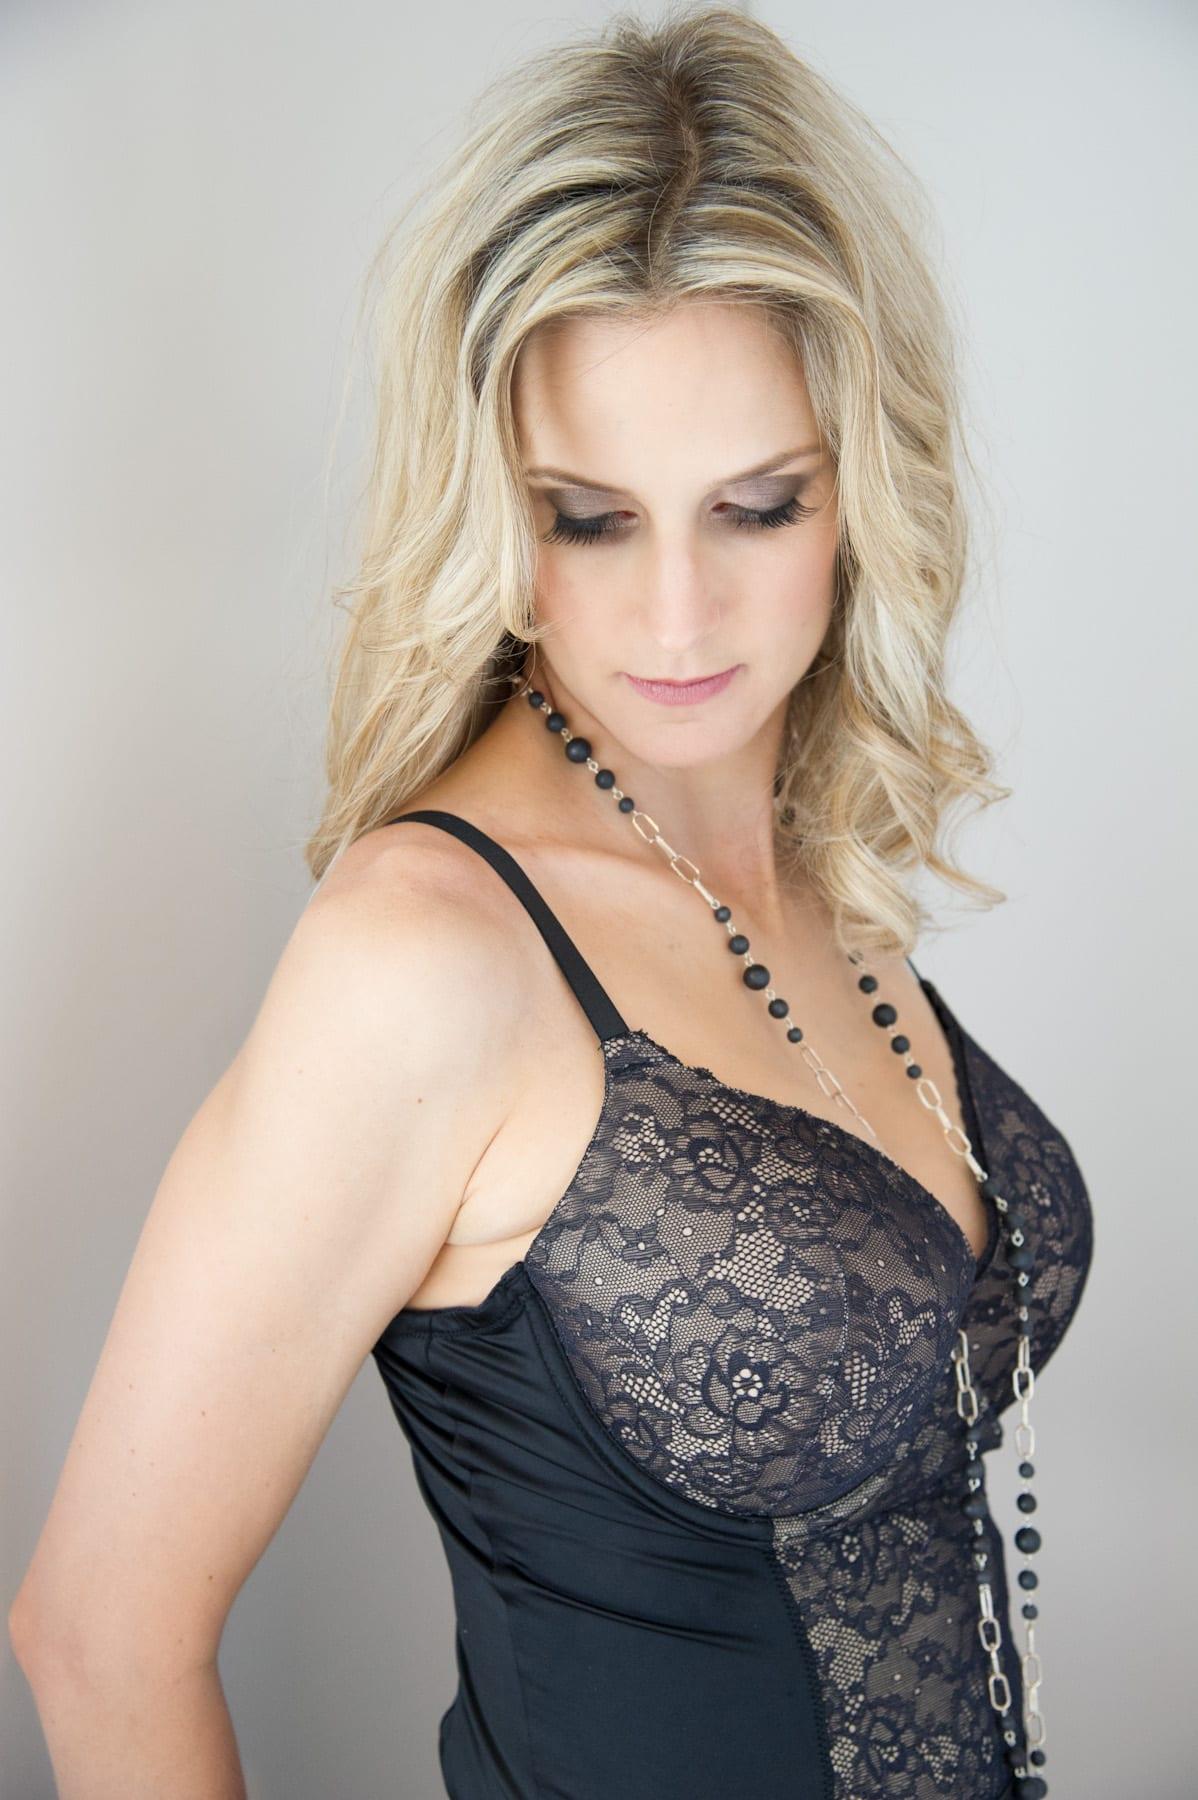 Hair- Angela Model-Erin Photographer- Nicole Redwine Location- Atlanta, GA